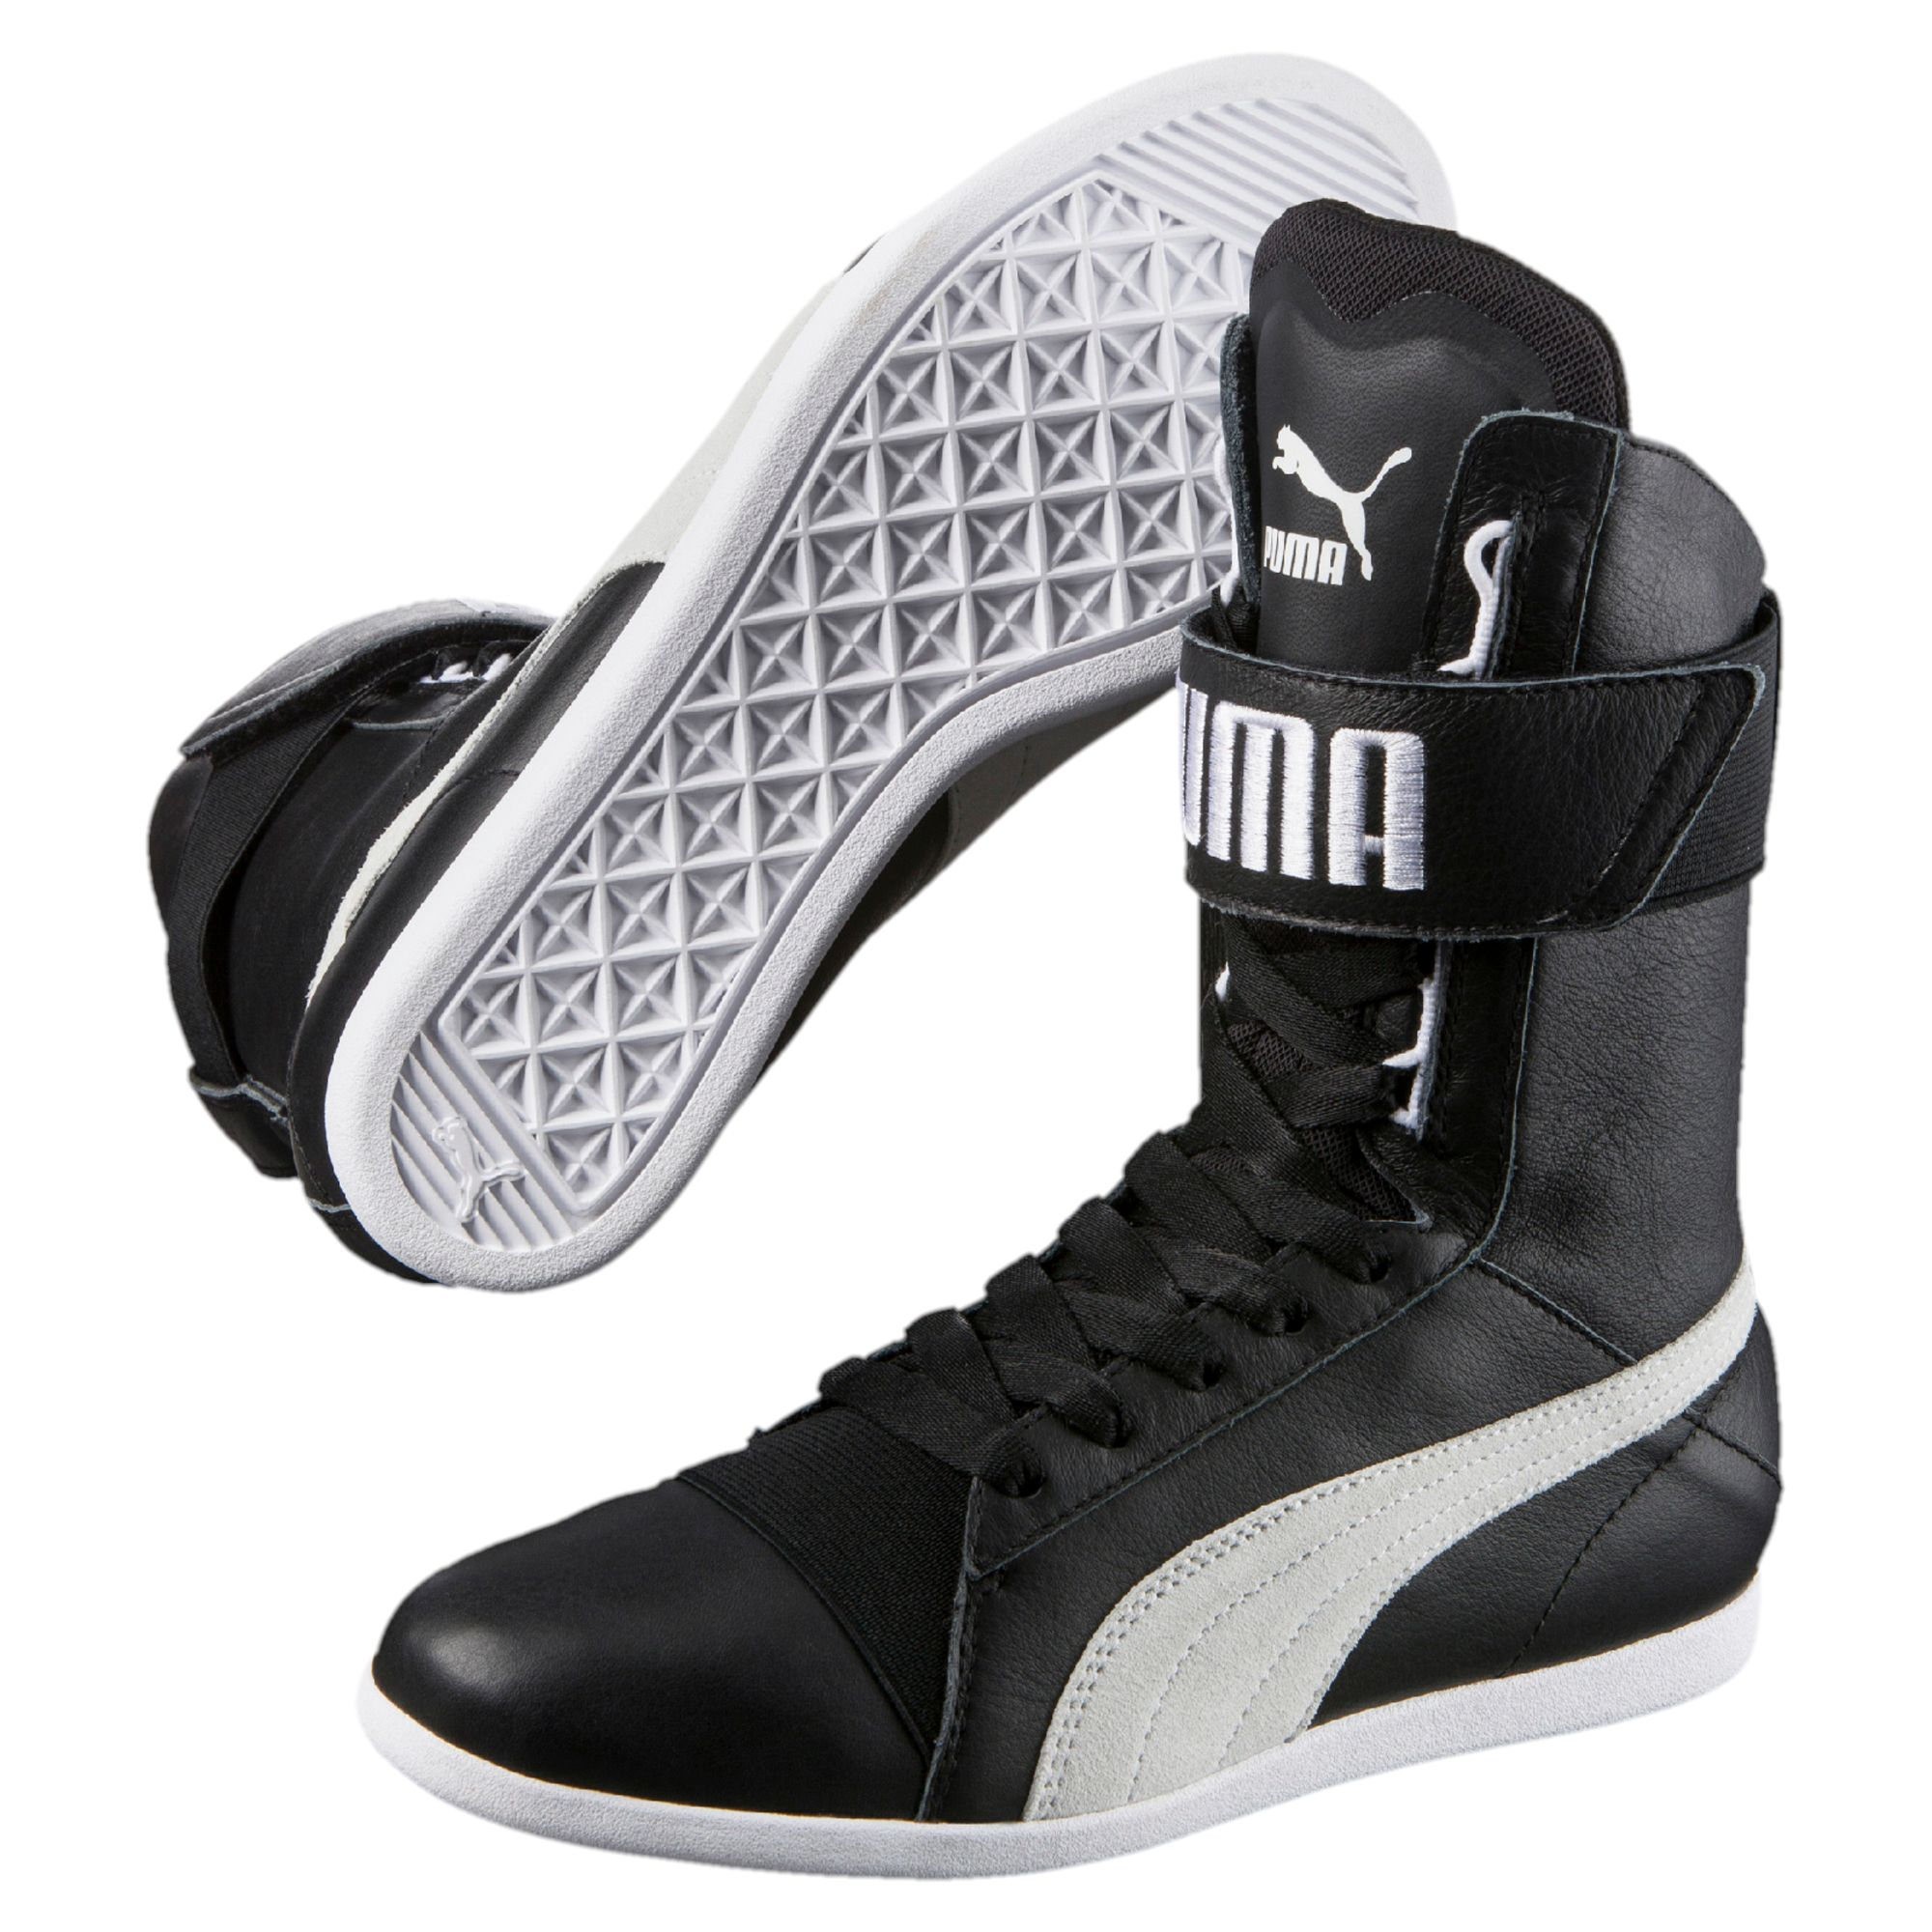 1d8d5020815e PUMA Eskiva New Hi Damen Stiefel Hohe Stiefel Frauen Neu   eBay